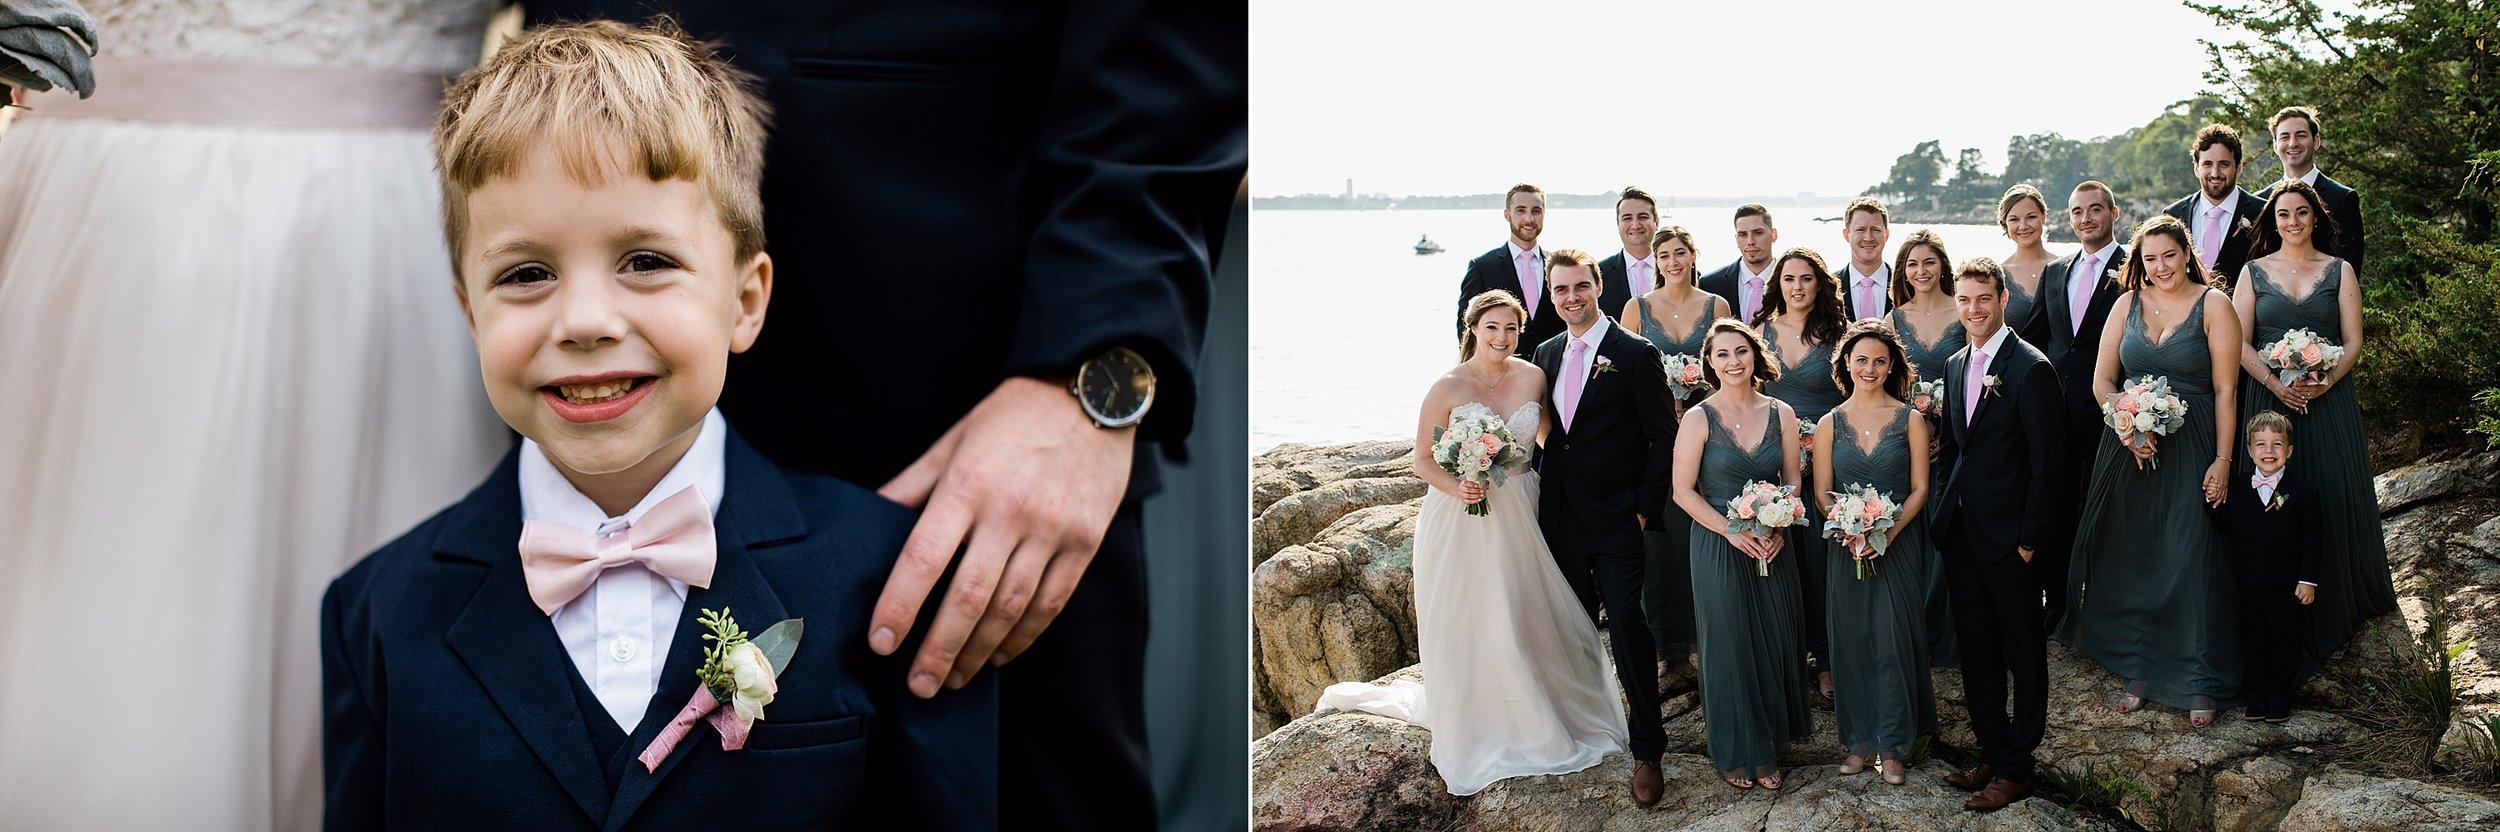 017 los angeles wedding photographer todd danforth photography boston.jpg